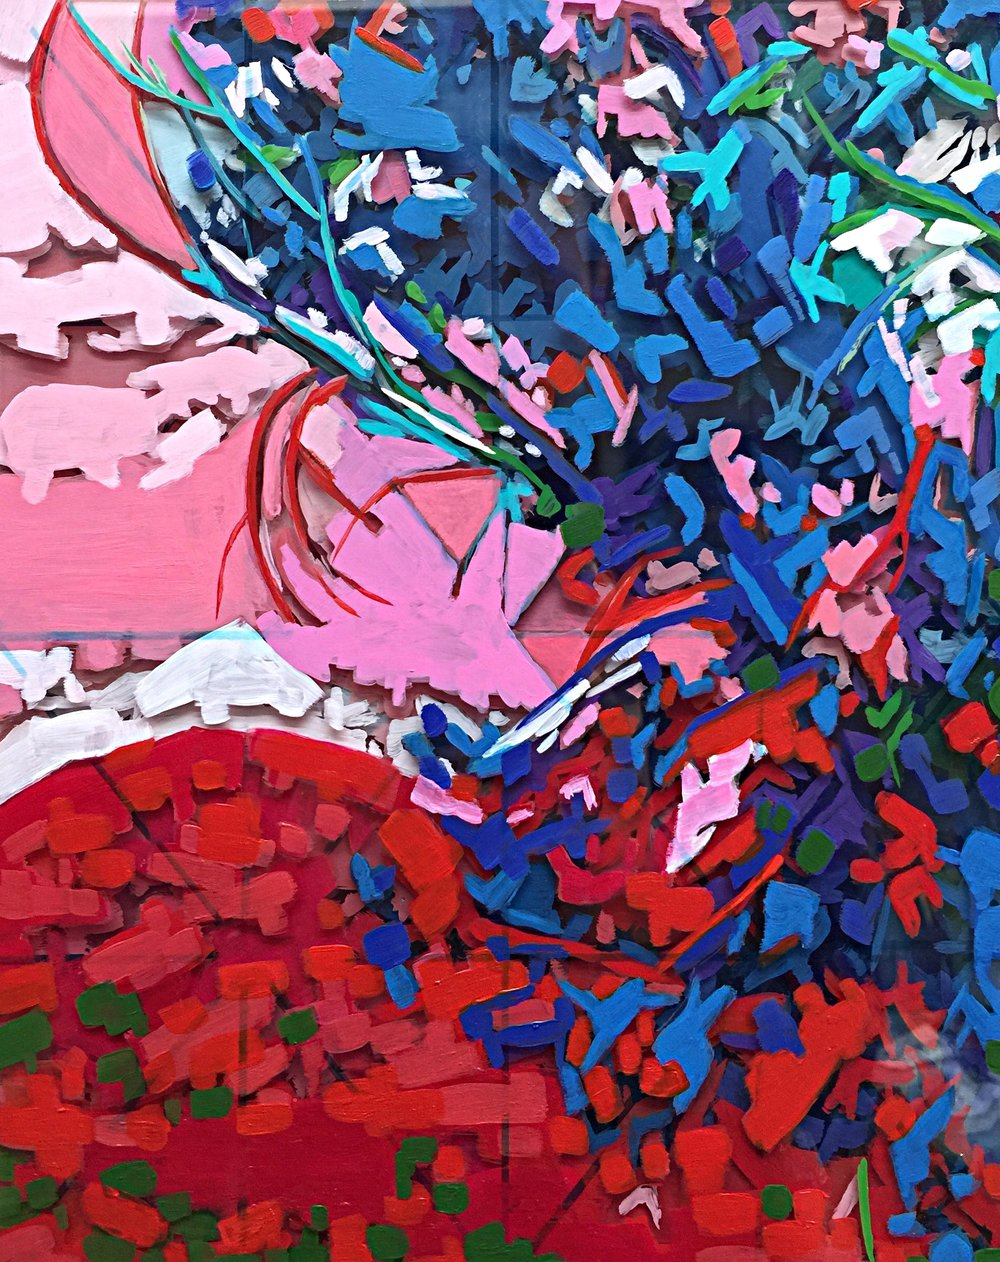 "Sunset, 8"" x 8"" Acrylic on Multi-Layered Acrylic Glass"